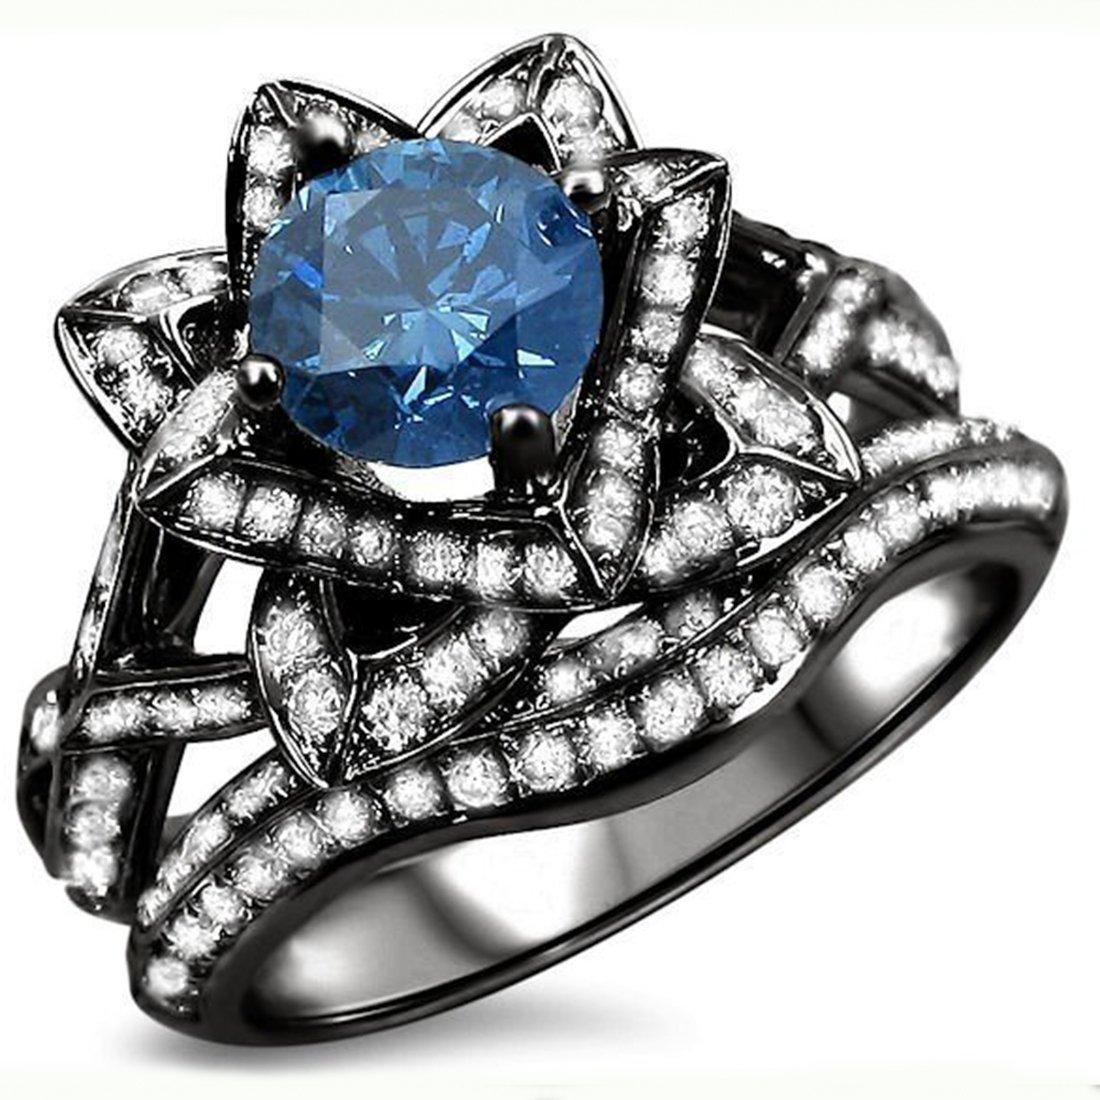 Smjewels 2.05 Ct Blue Round Sim.Diamond Lotus Flower Engagement Ring Set 14K Black Gold Plated